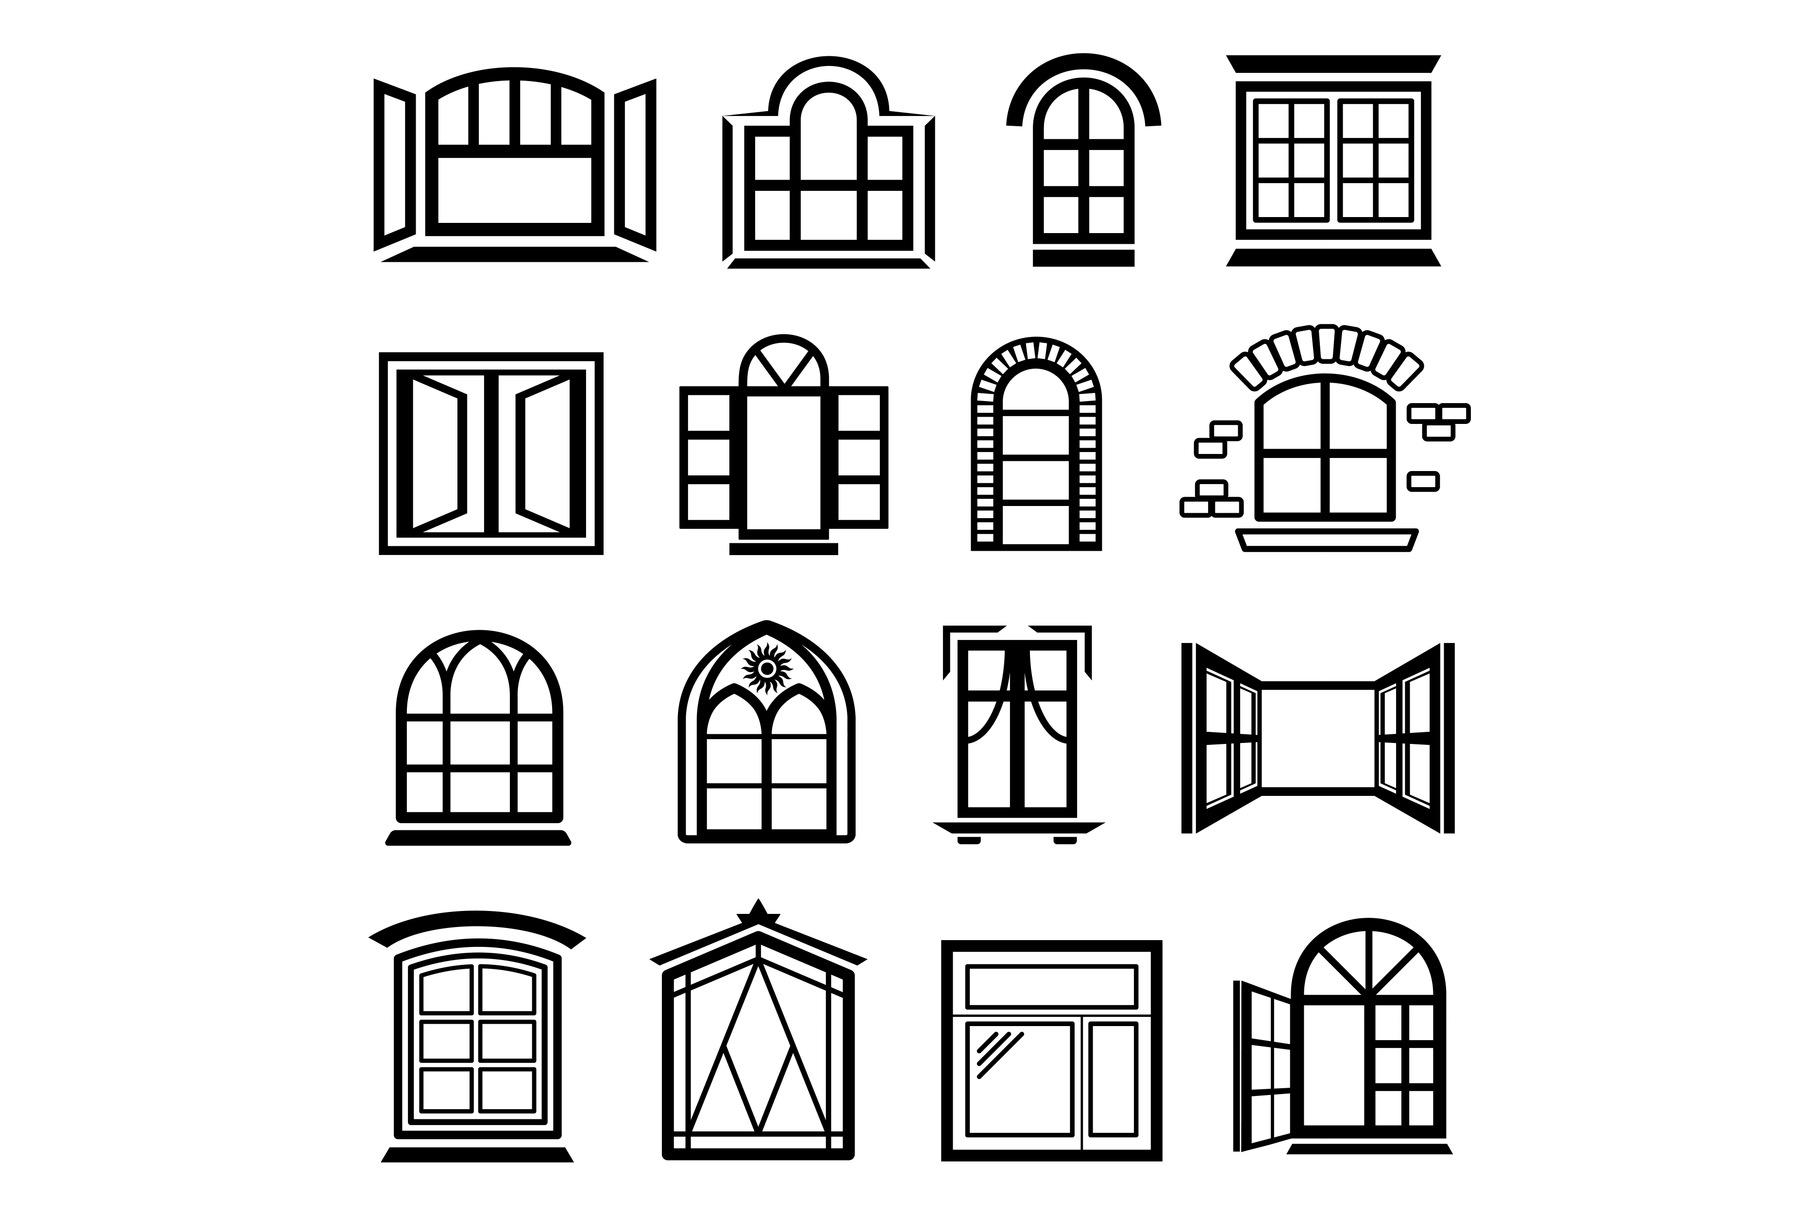 Window design icons set, simple style example image 1